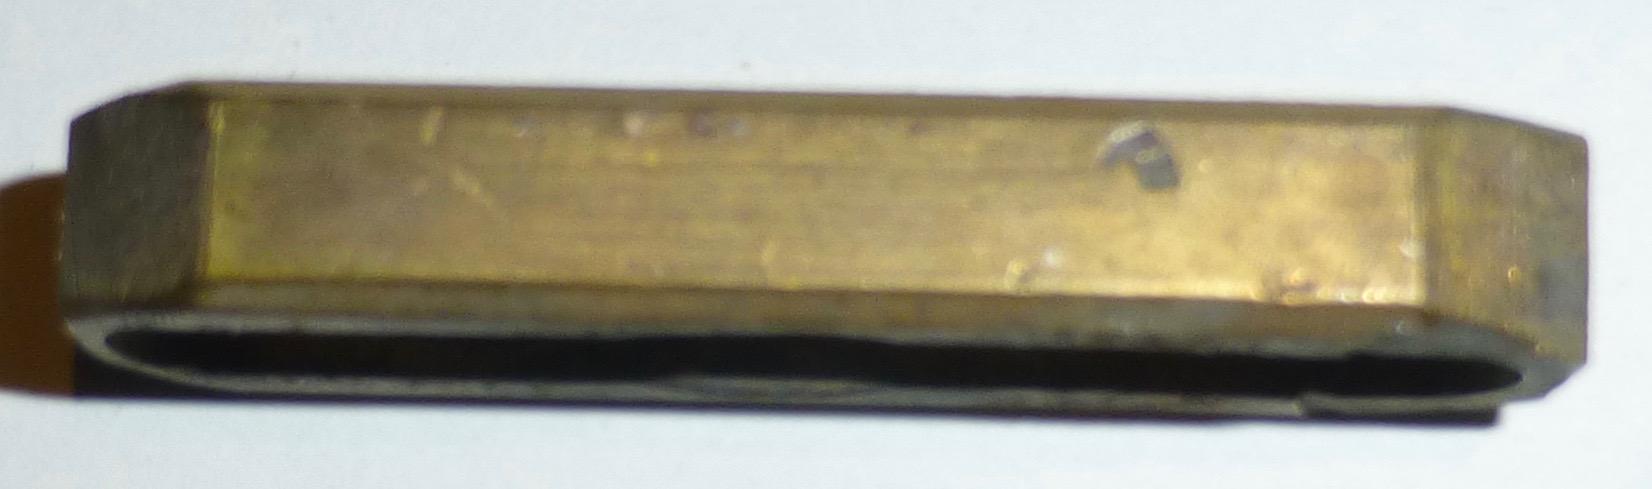 P1100739